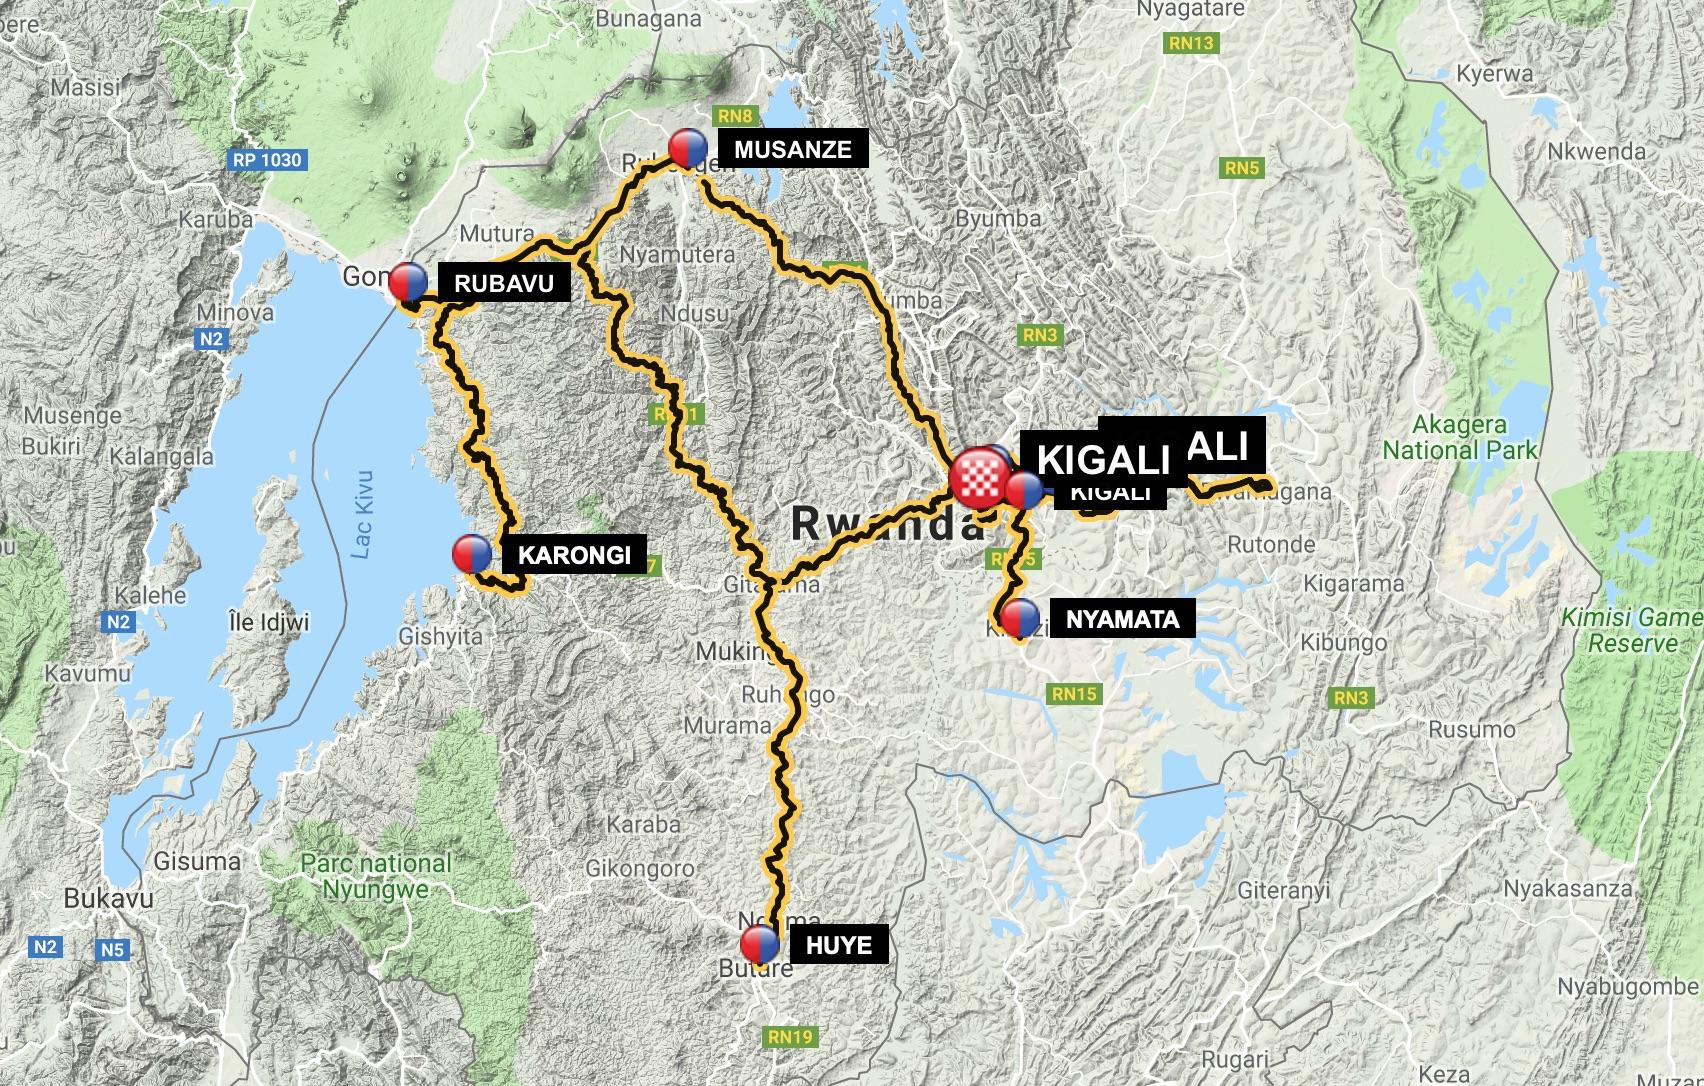 https://www.procyclingstats.com/images/profiles/ap/db/tour-of-rwanda-2019-map-25c7535f3f.jpg